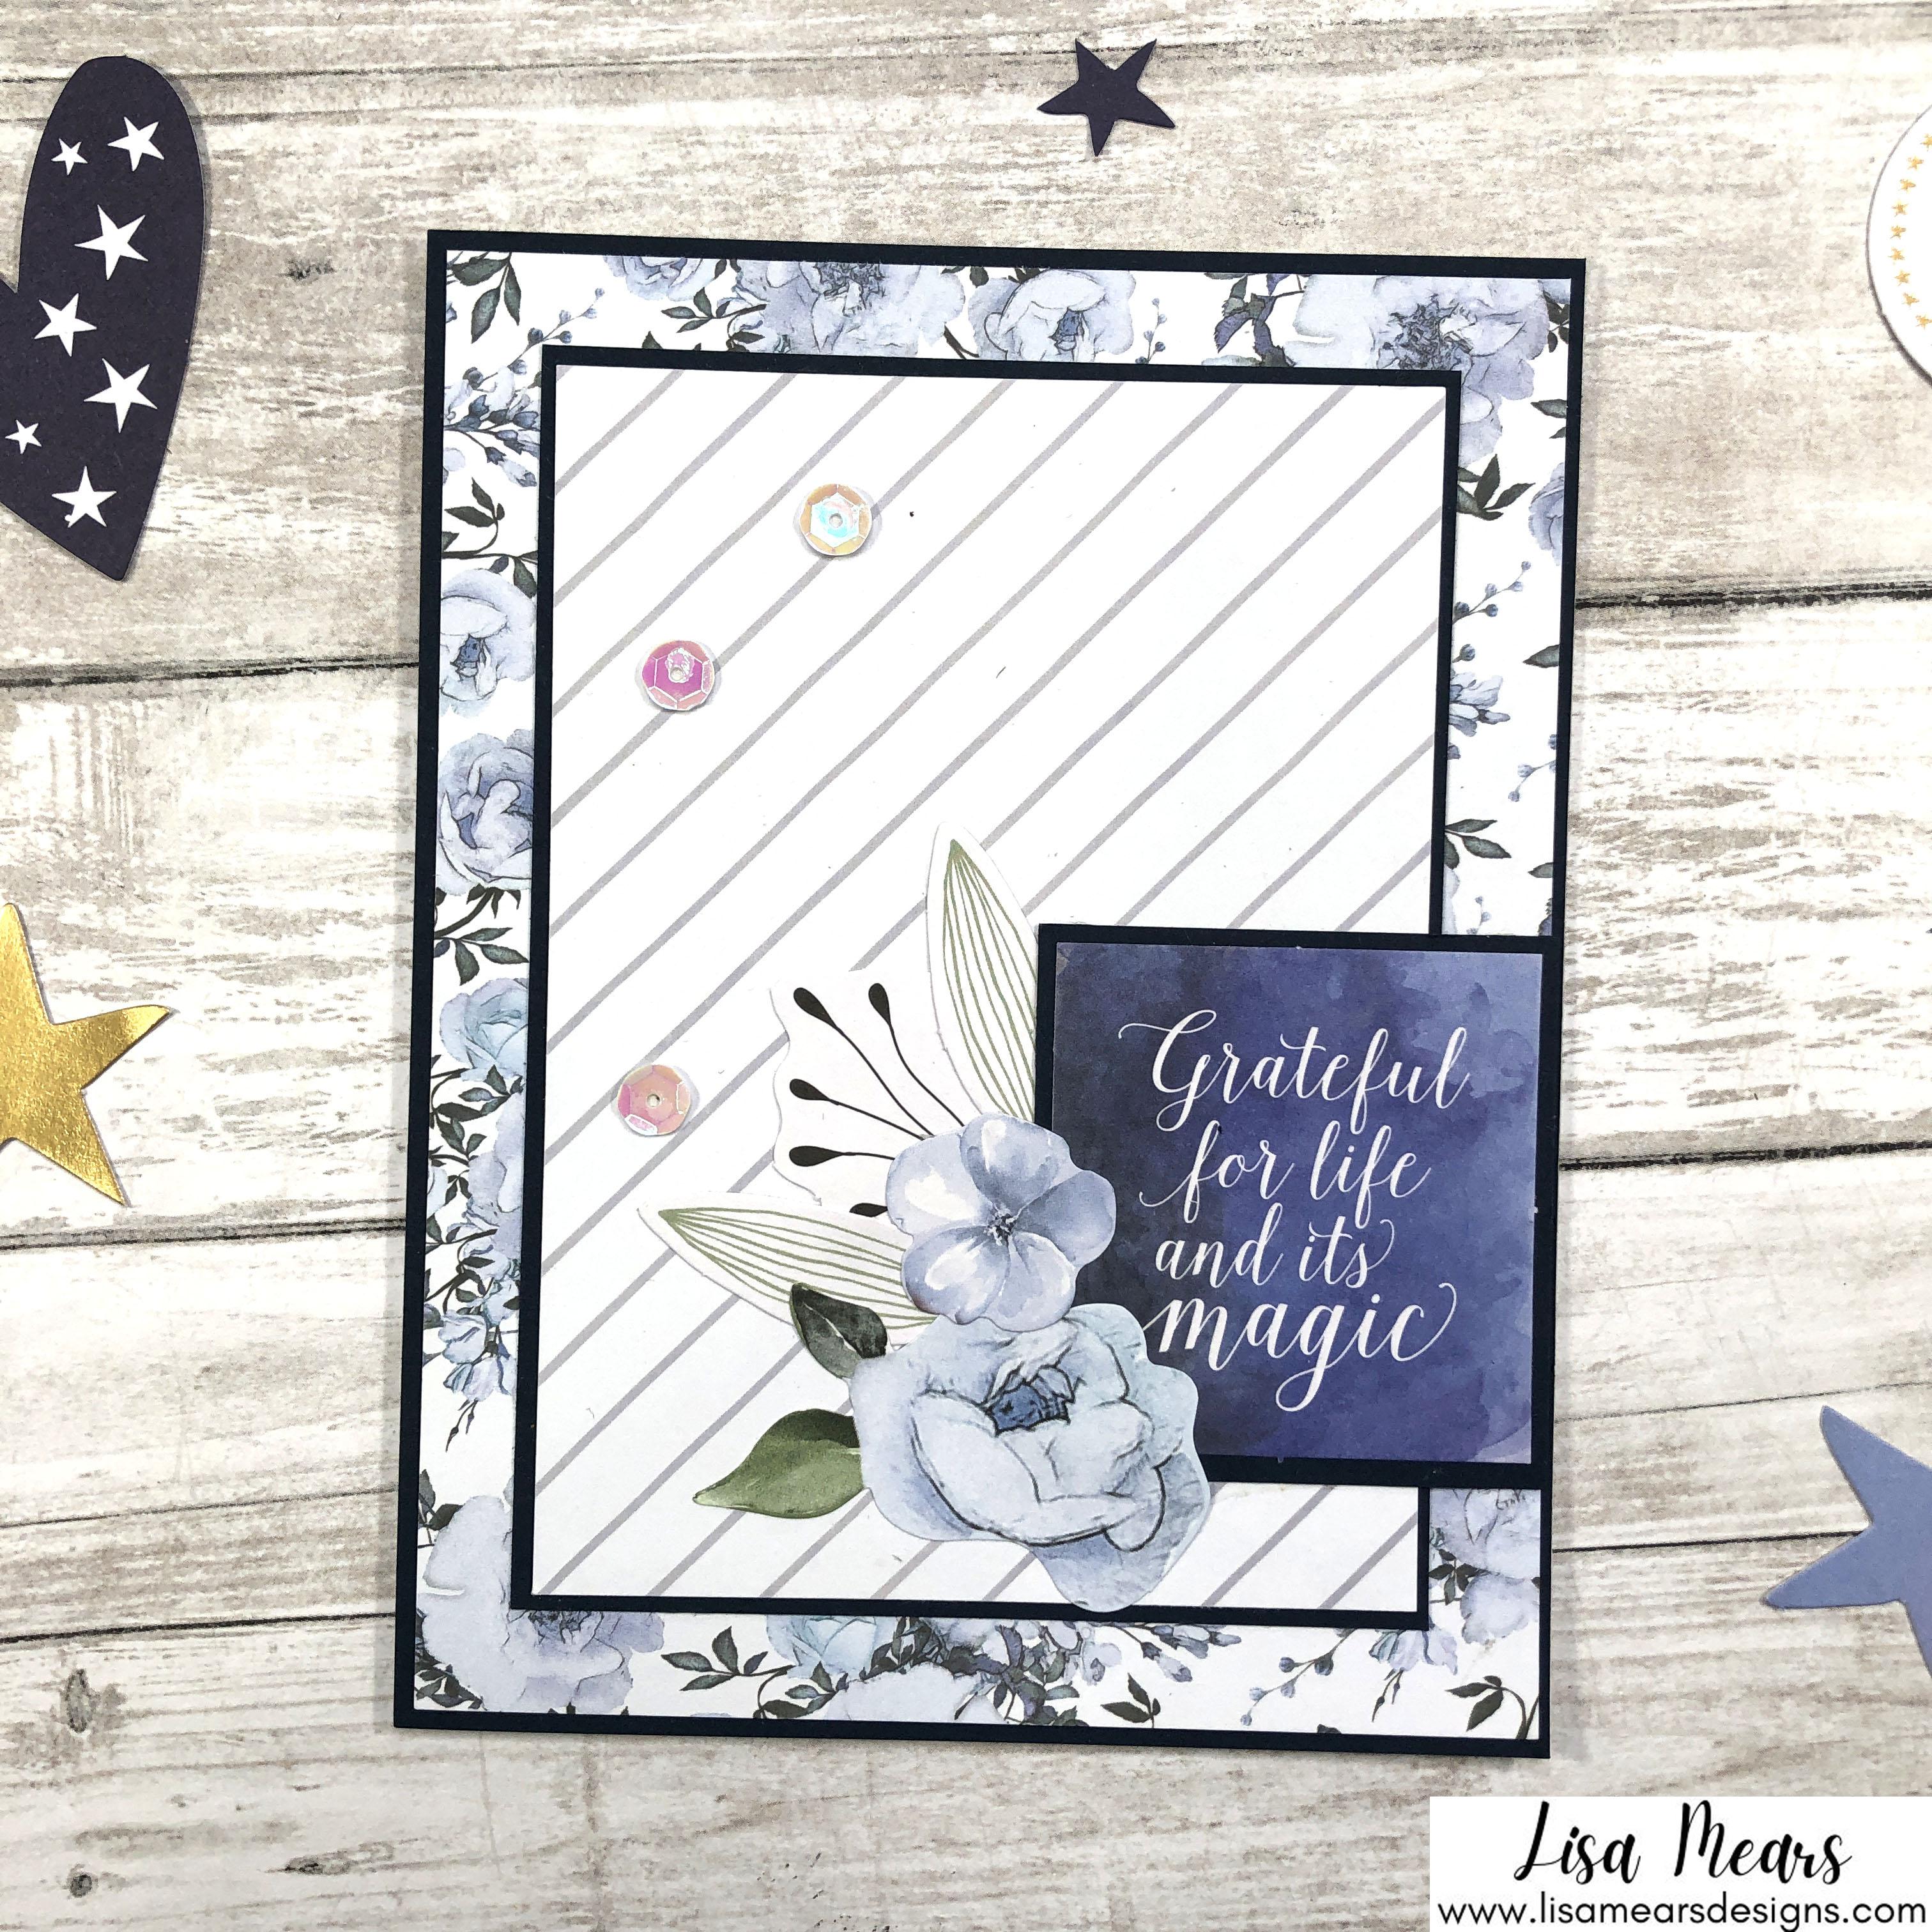 Spellbinders October 2021 Card Kit - You are Stellar! Flower Card